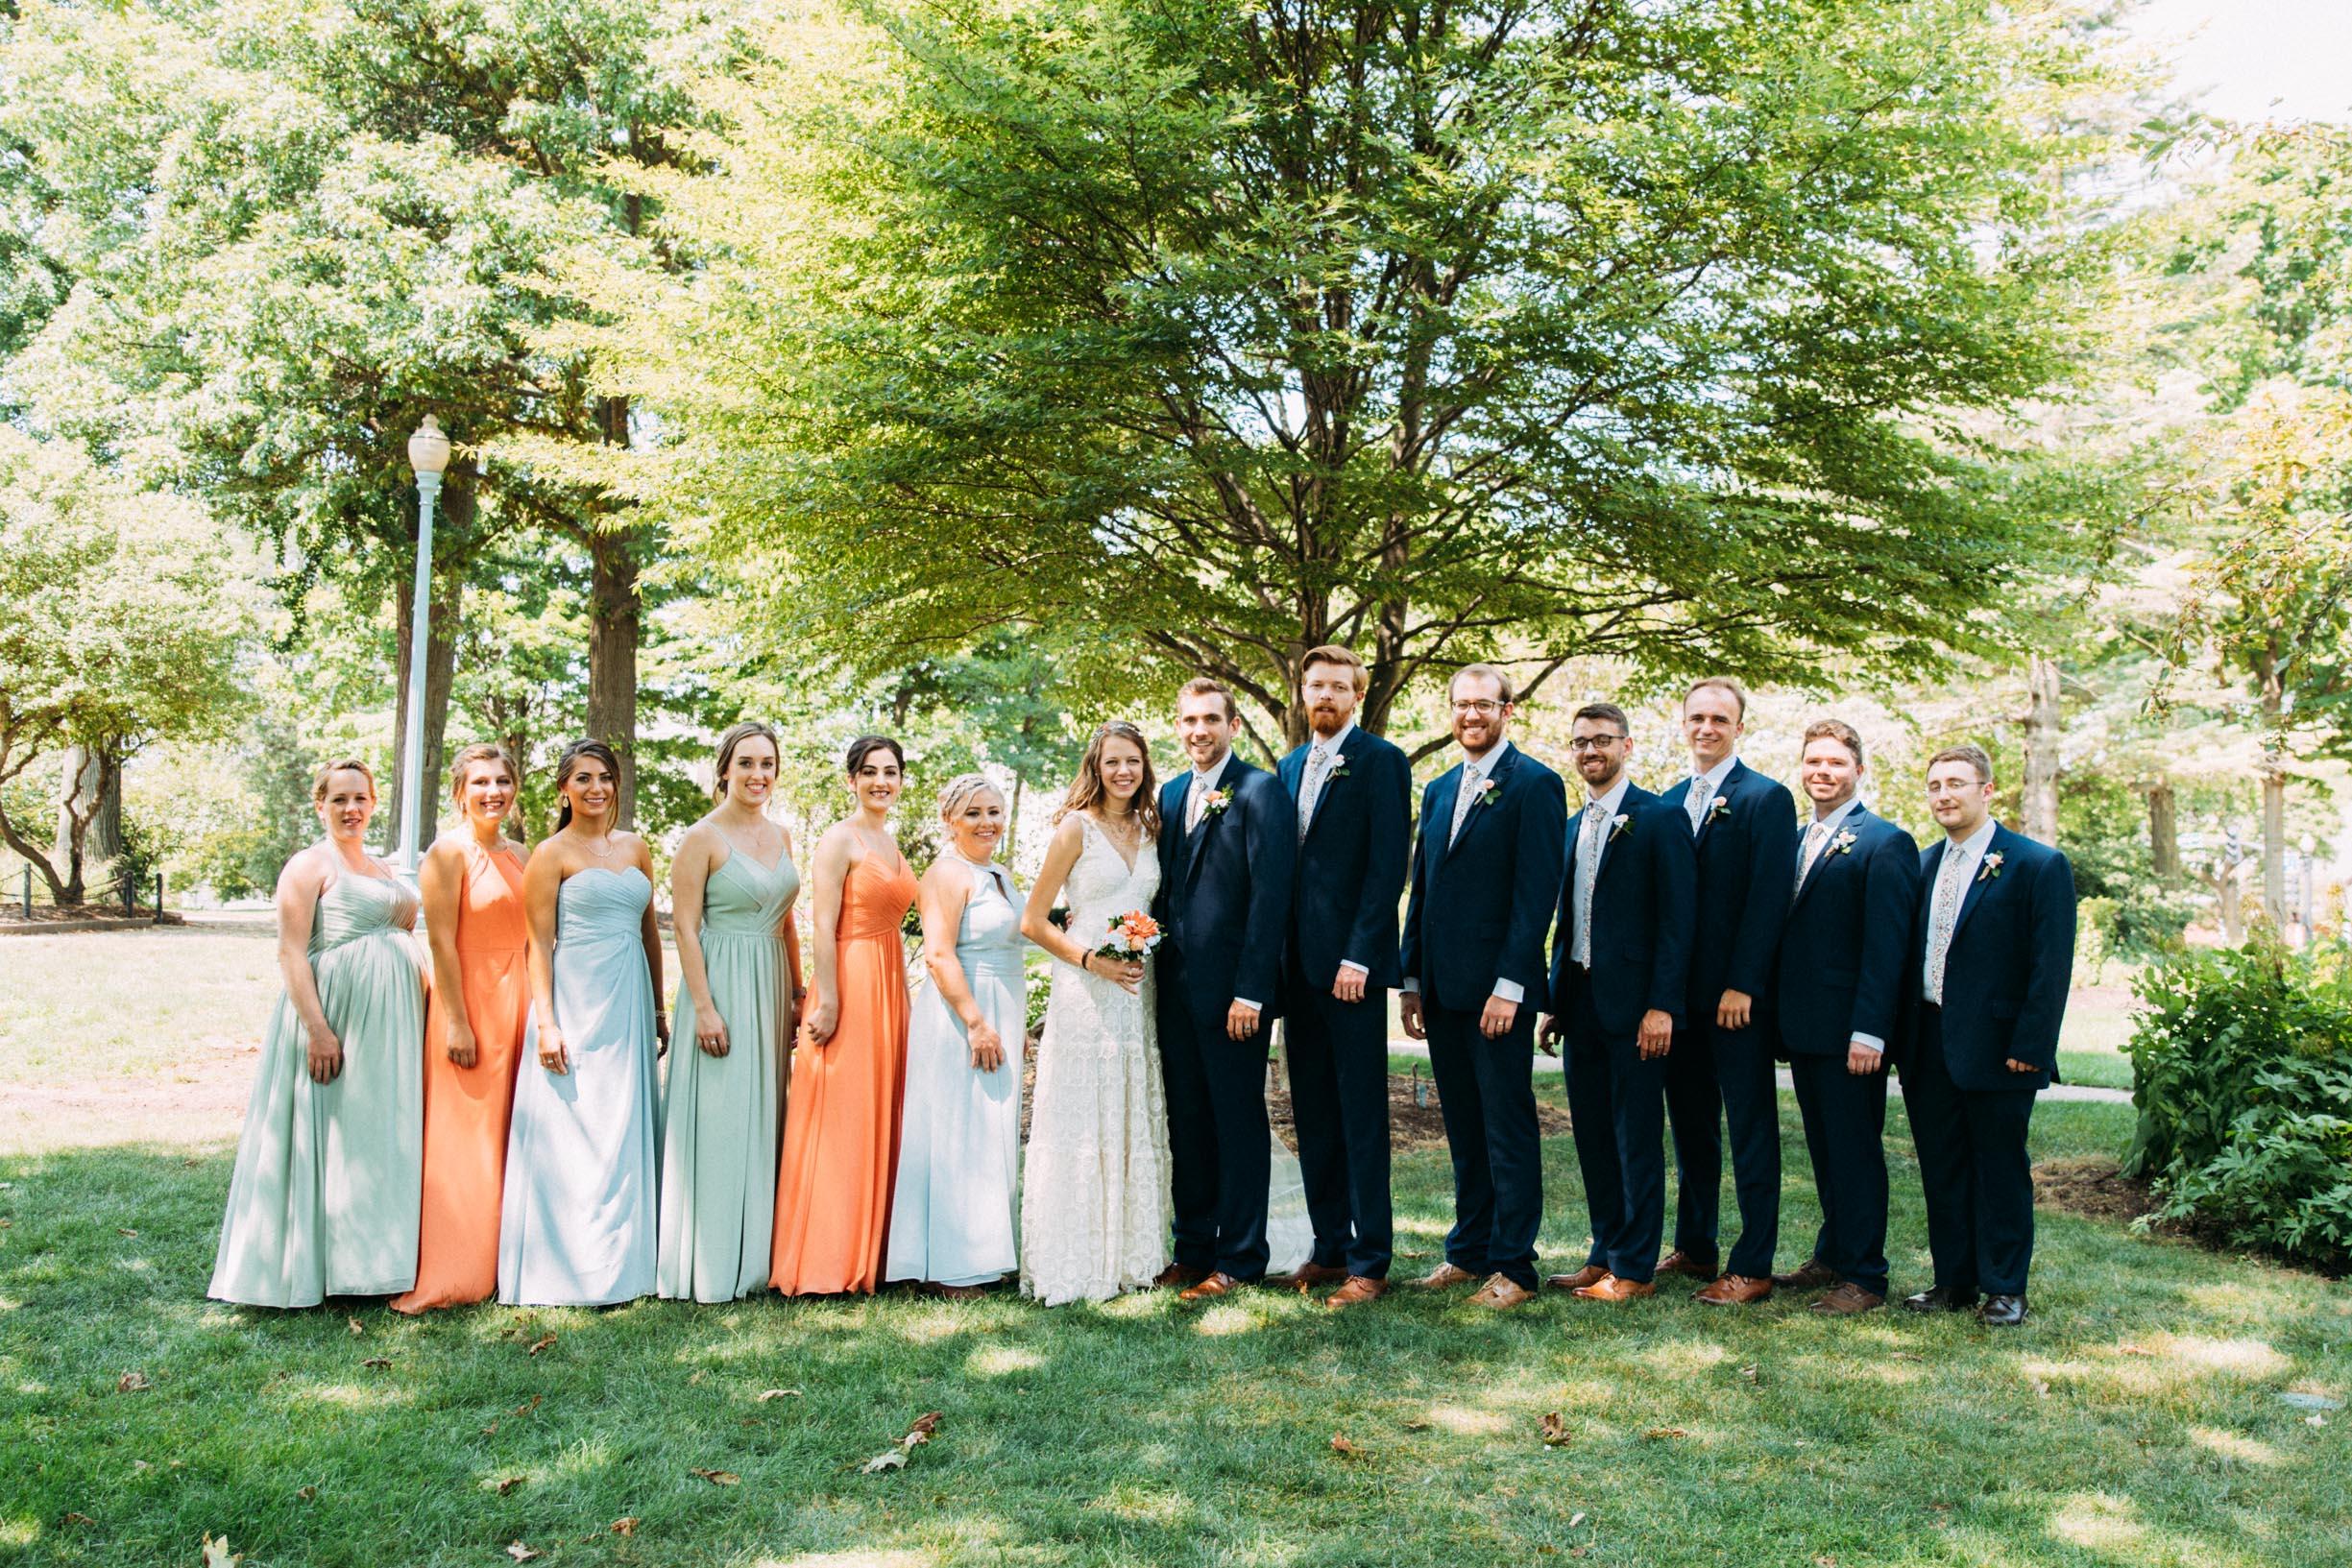 Rachel Josh Wedding Party Portrait Blog-21.jpg